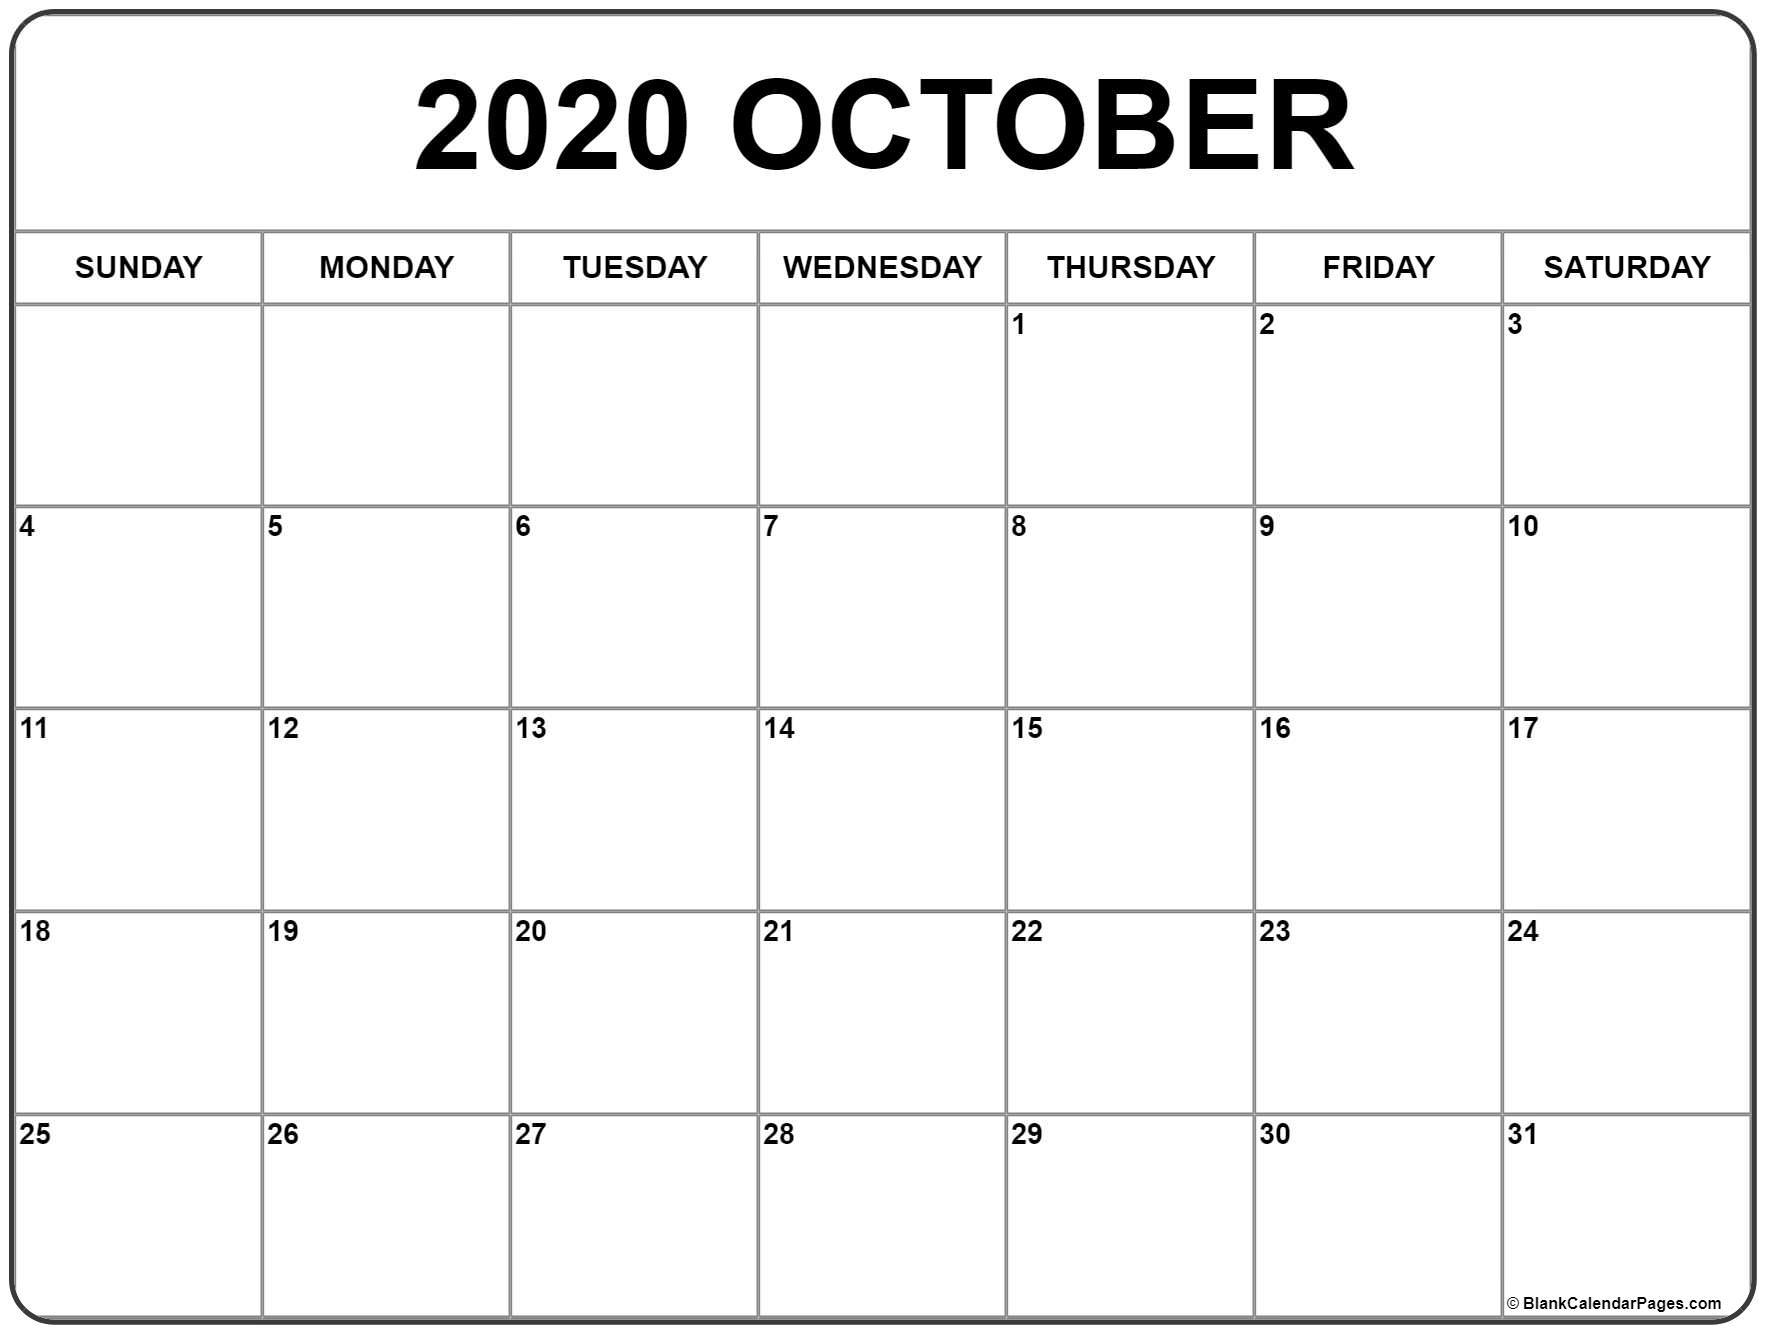 October 2020 Calendar | Free Printable Monthly Calendars